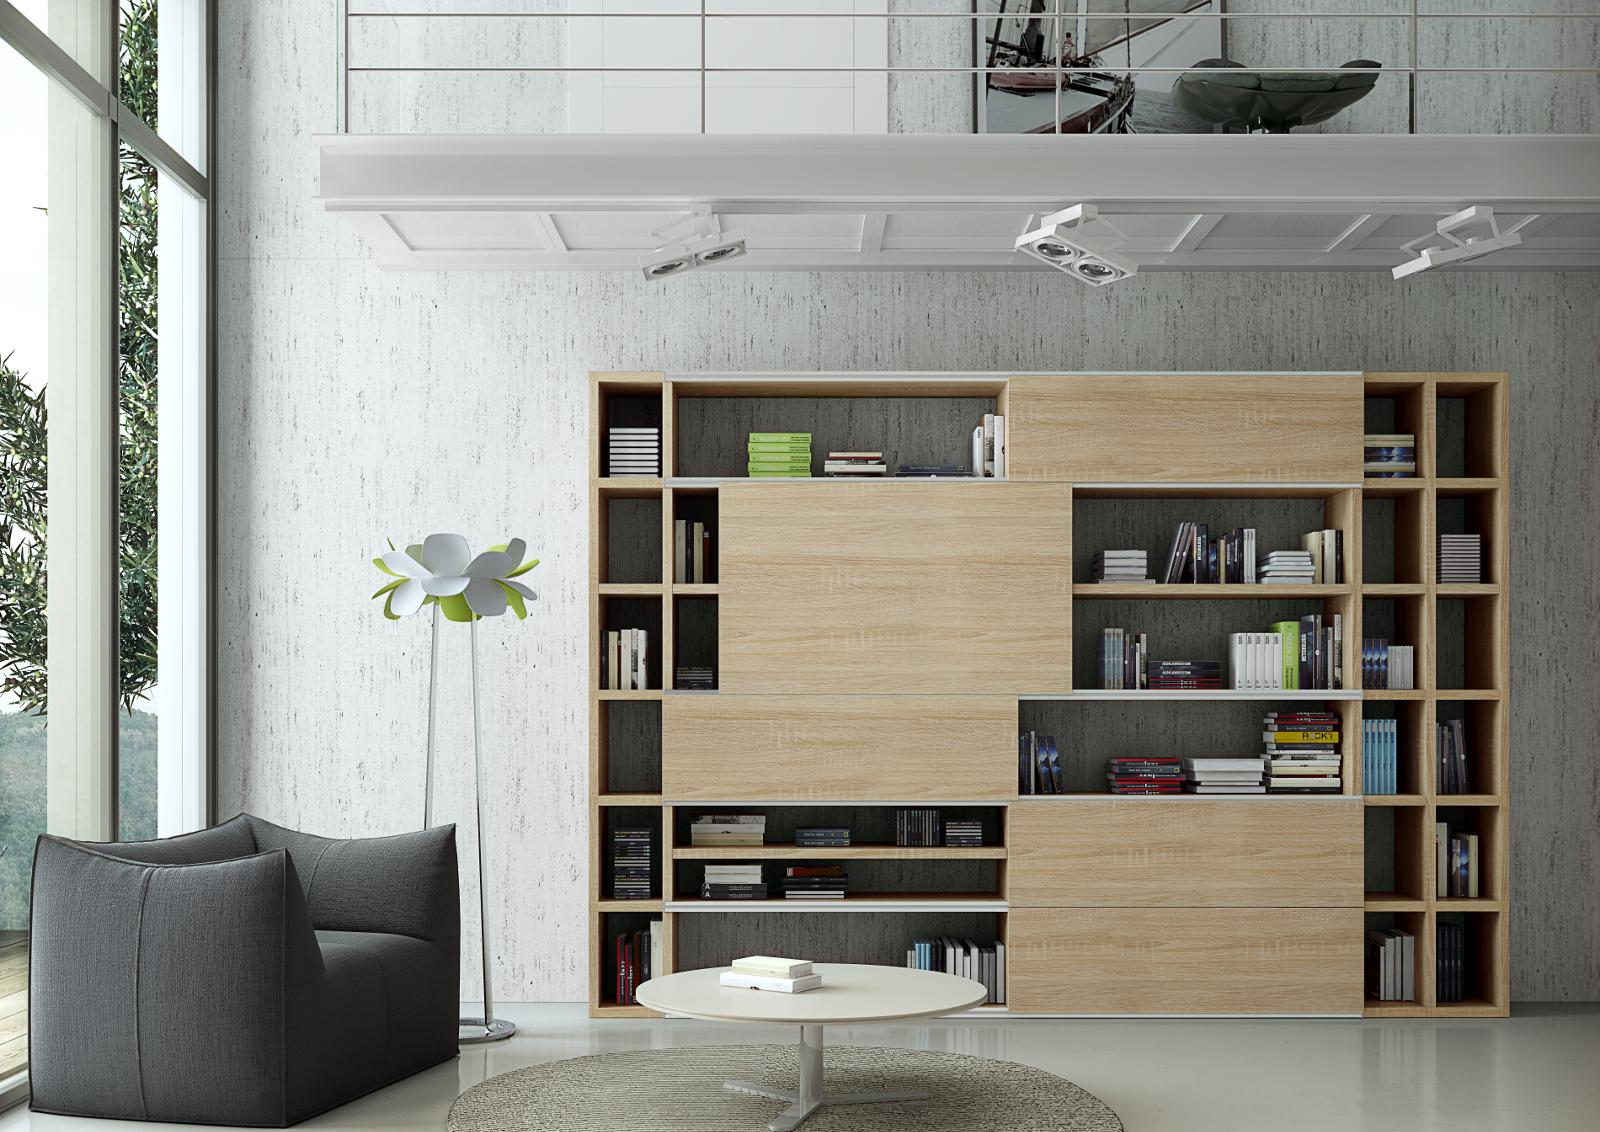 wohnwand b cherwand mediawand lack wei matt. Black Bedroom Furniture Sets. Home Design Ideas